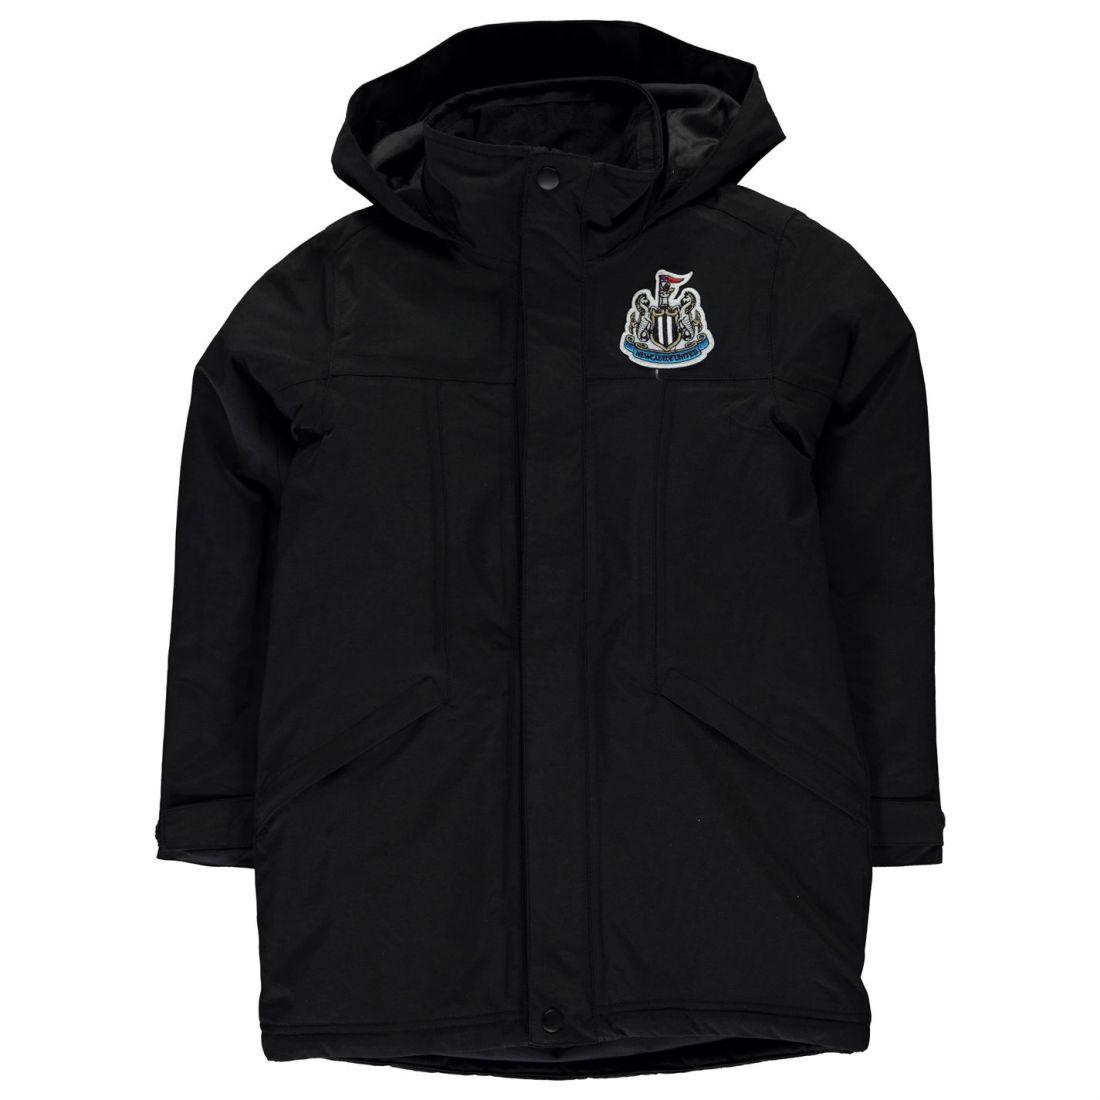 ad45e02f774e Team Kids Boys Parka Jacket Junior Coat Top Long Sleeve Hooded Zip ...